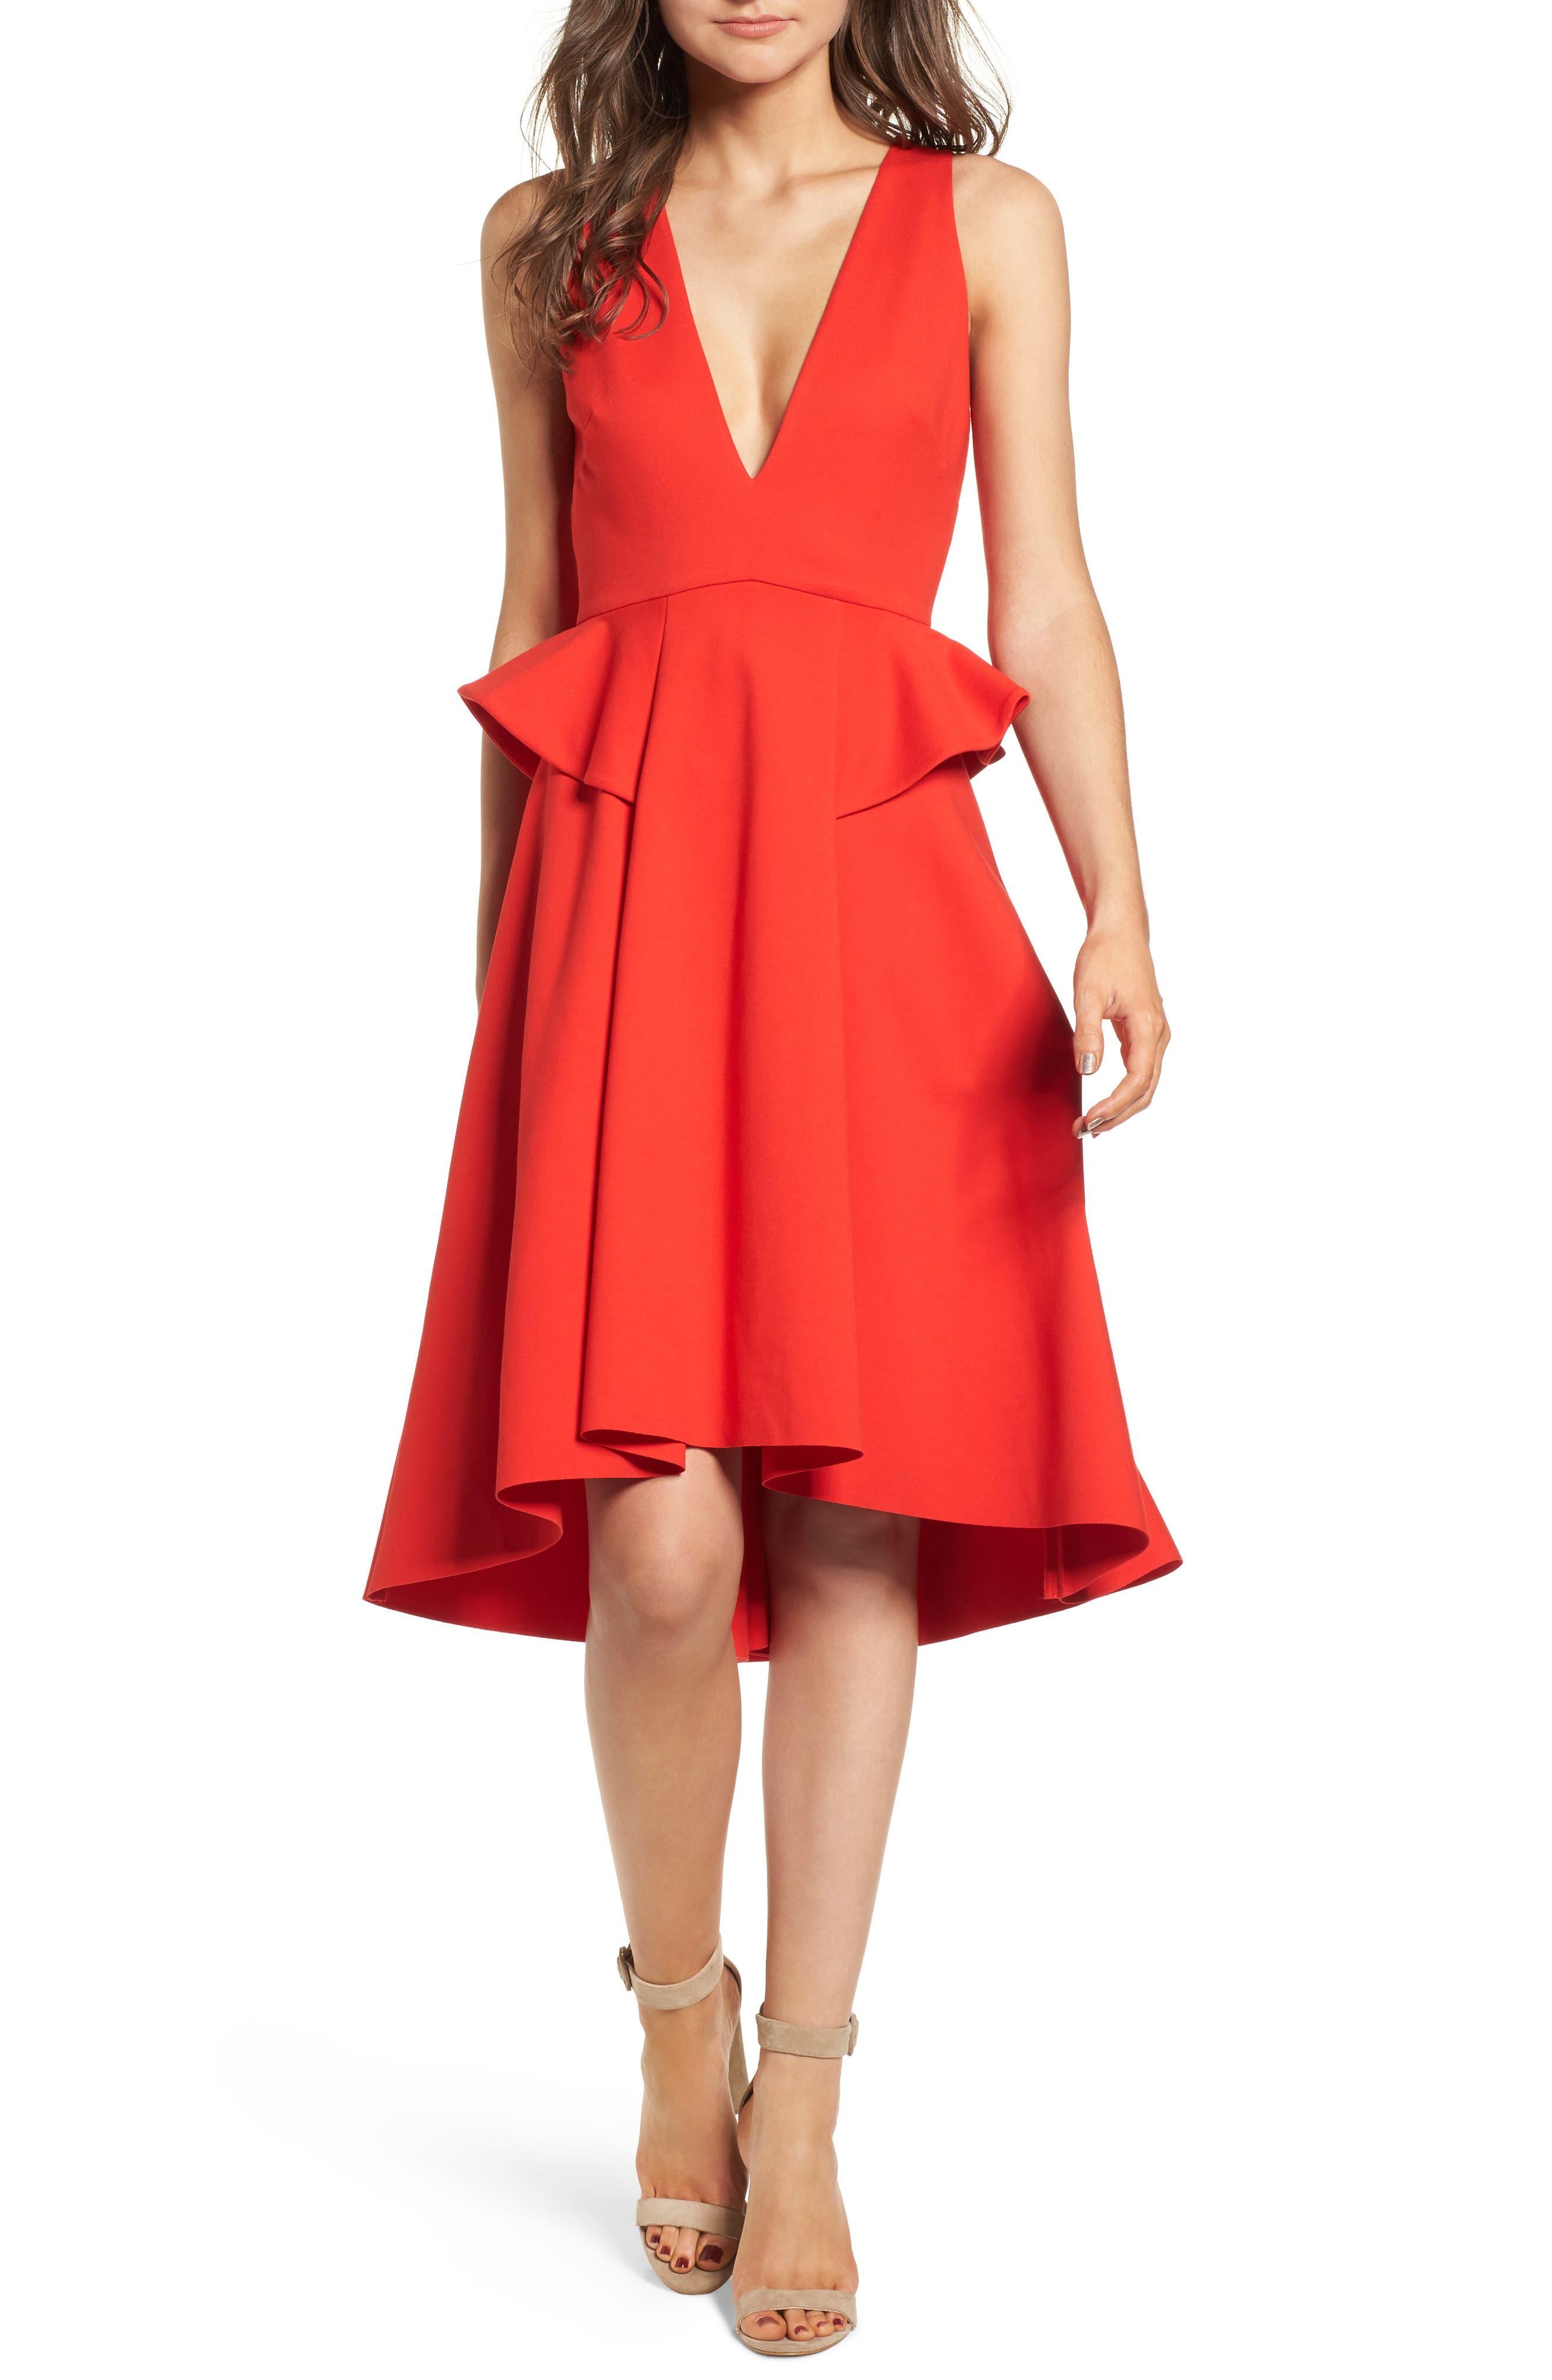 Formal Ruffle Dresses